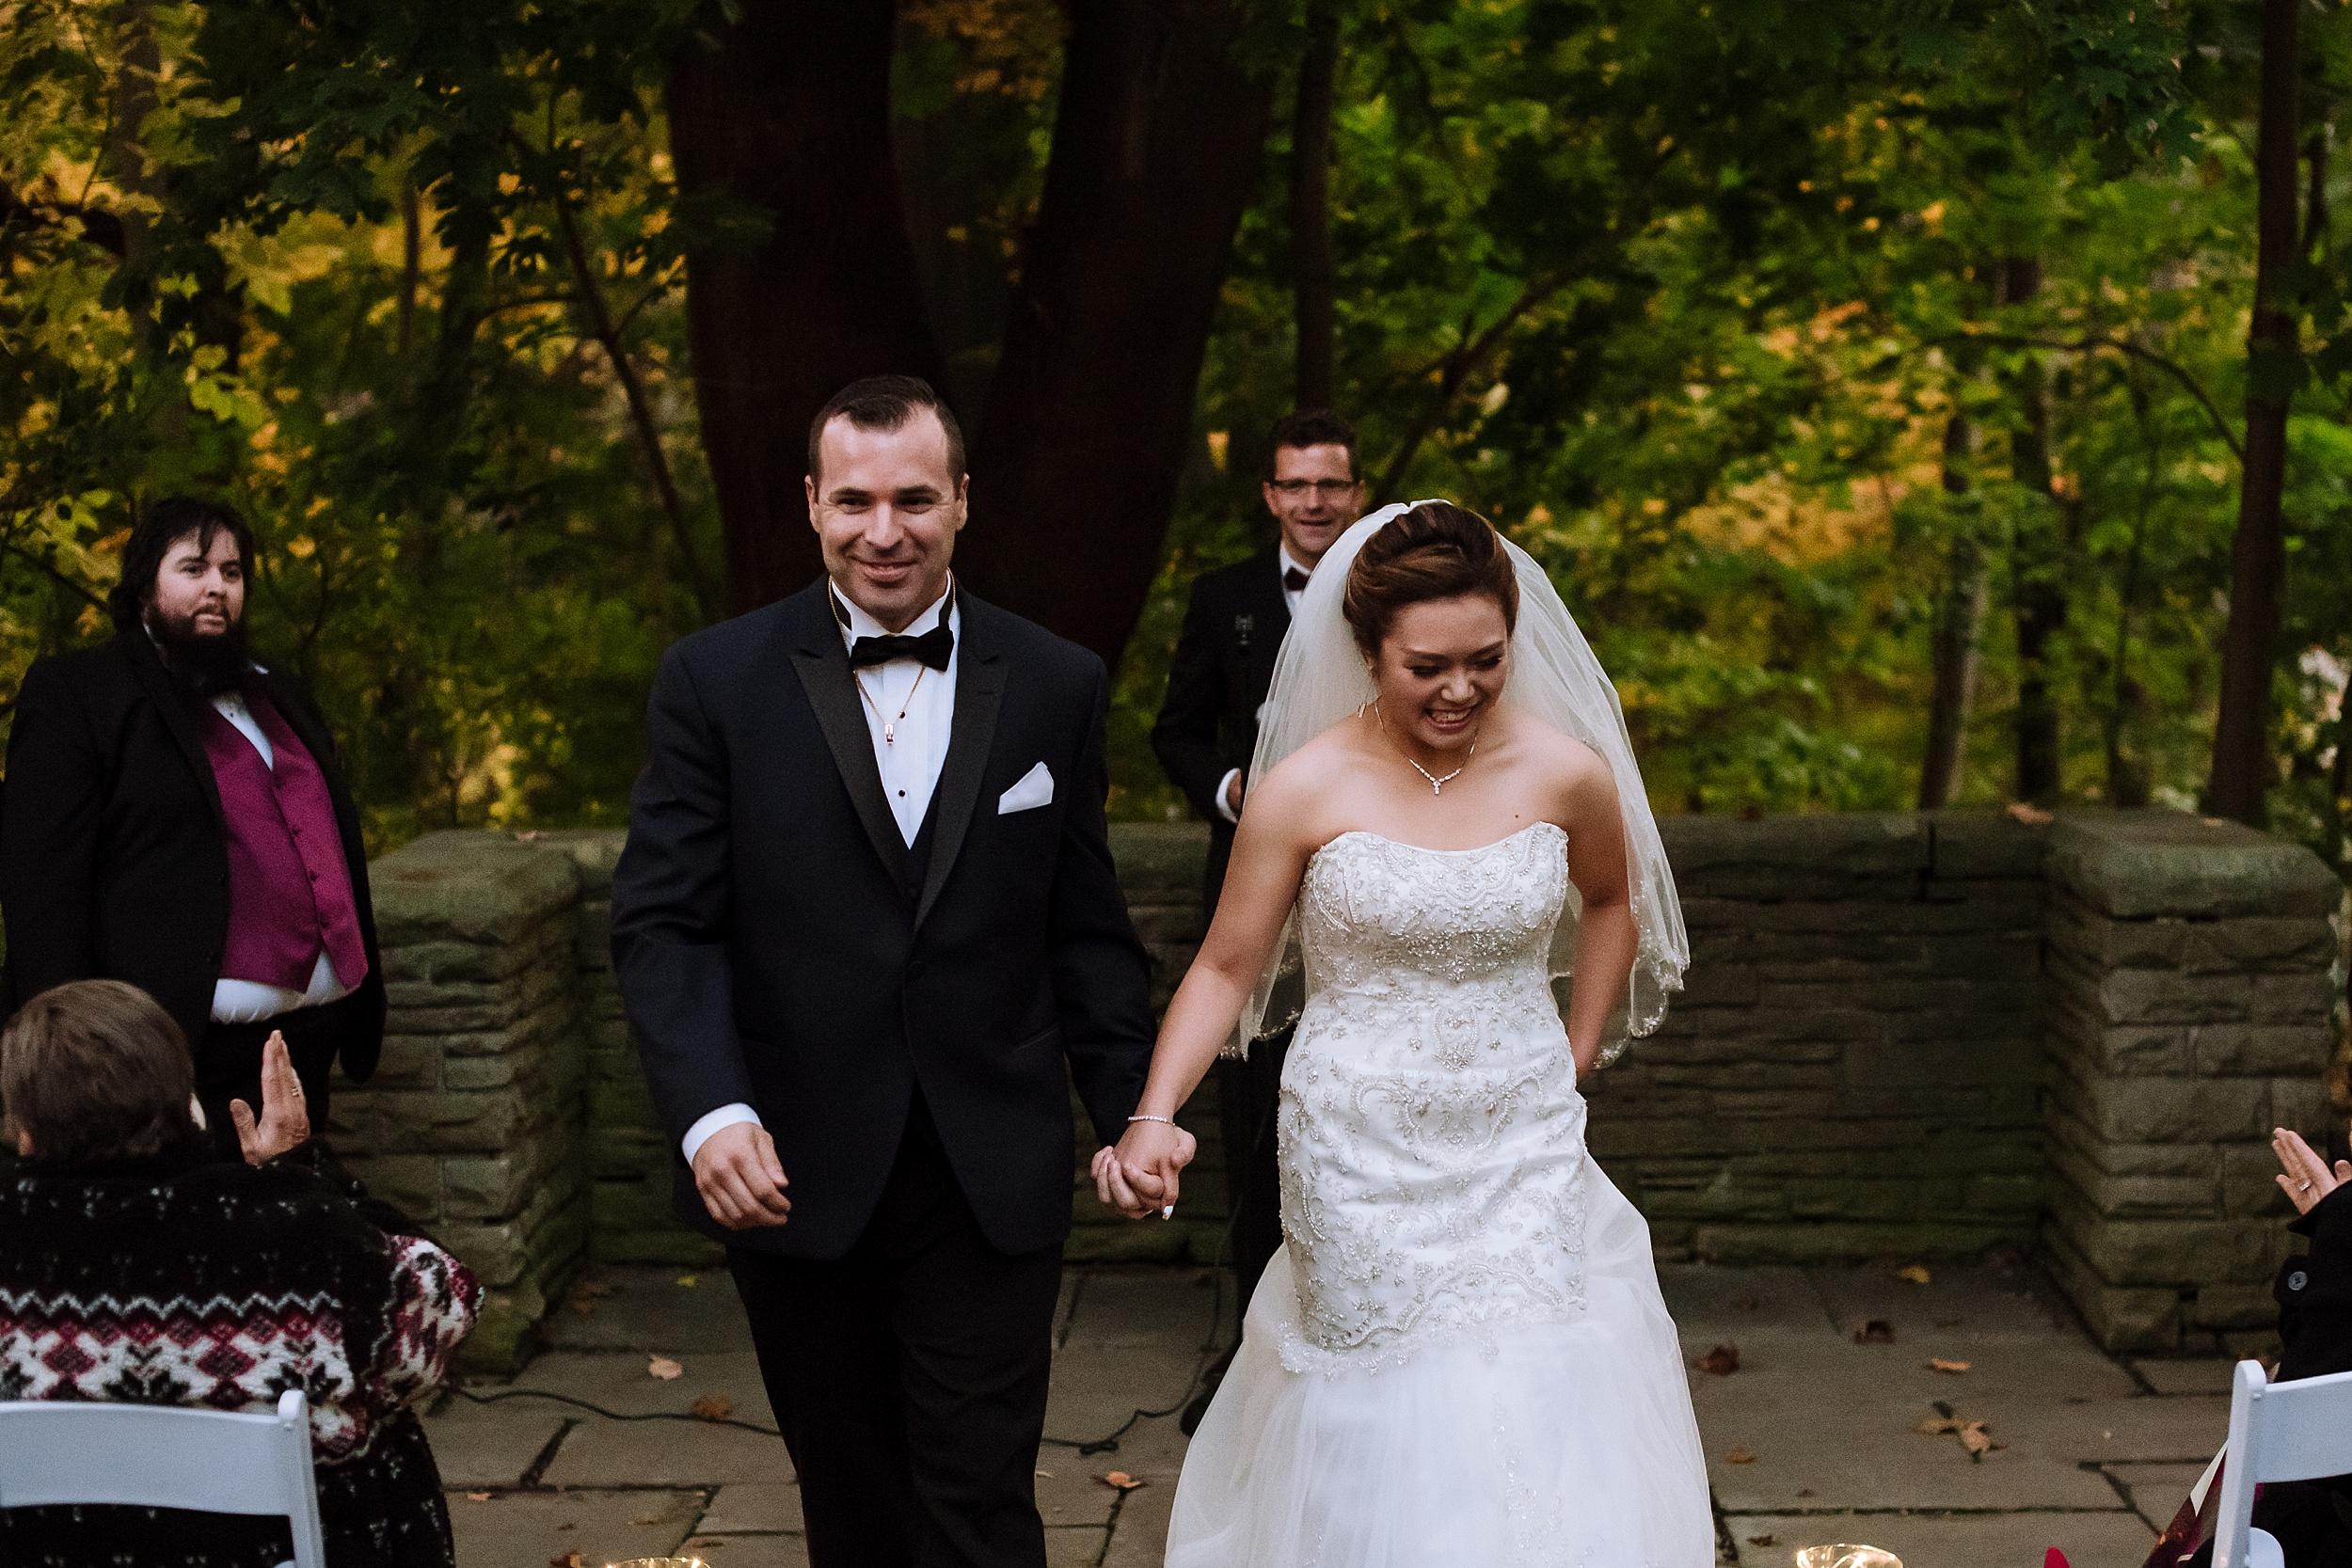 Sunnybrook_Estates_Alexander_Muir_Toronto_Wedding_Photographer_0061.jpg